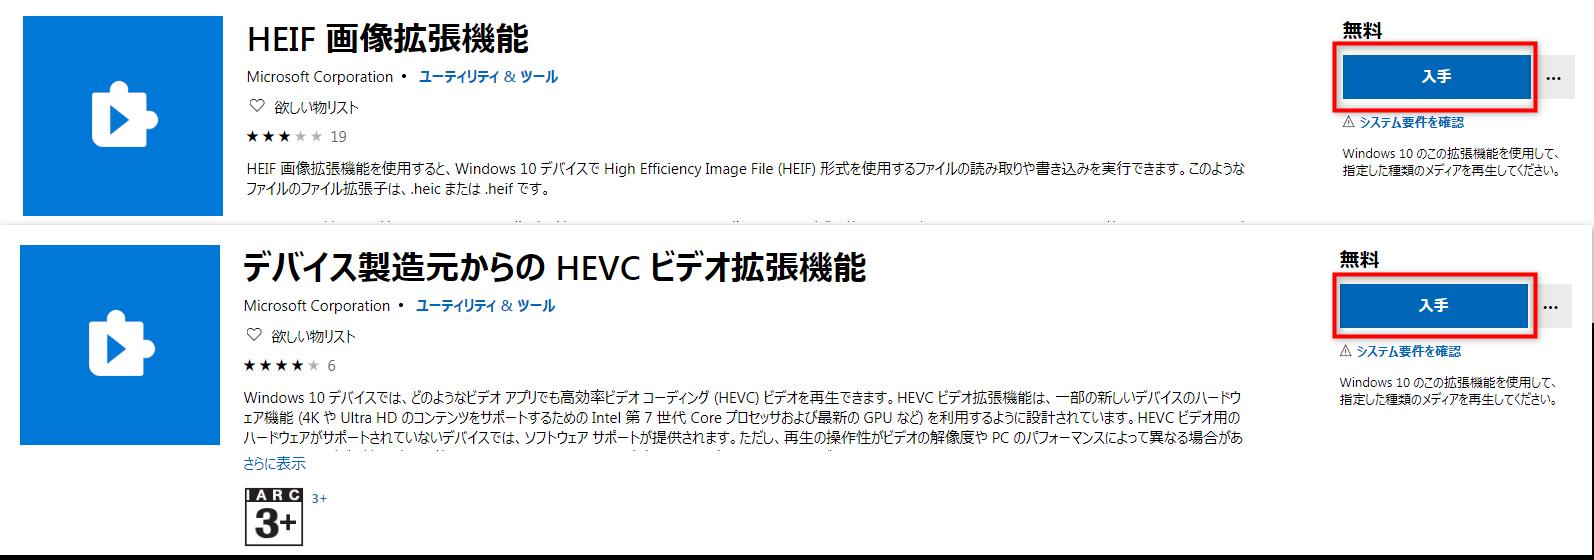 HEIC拡張機能をパソコンにインストール